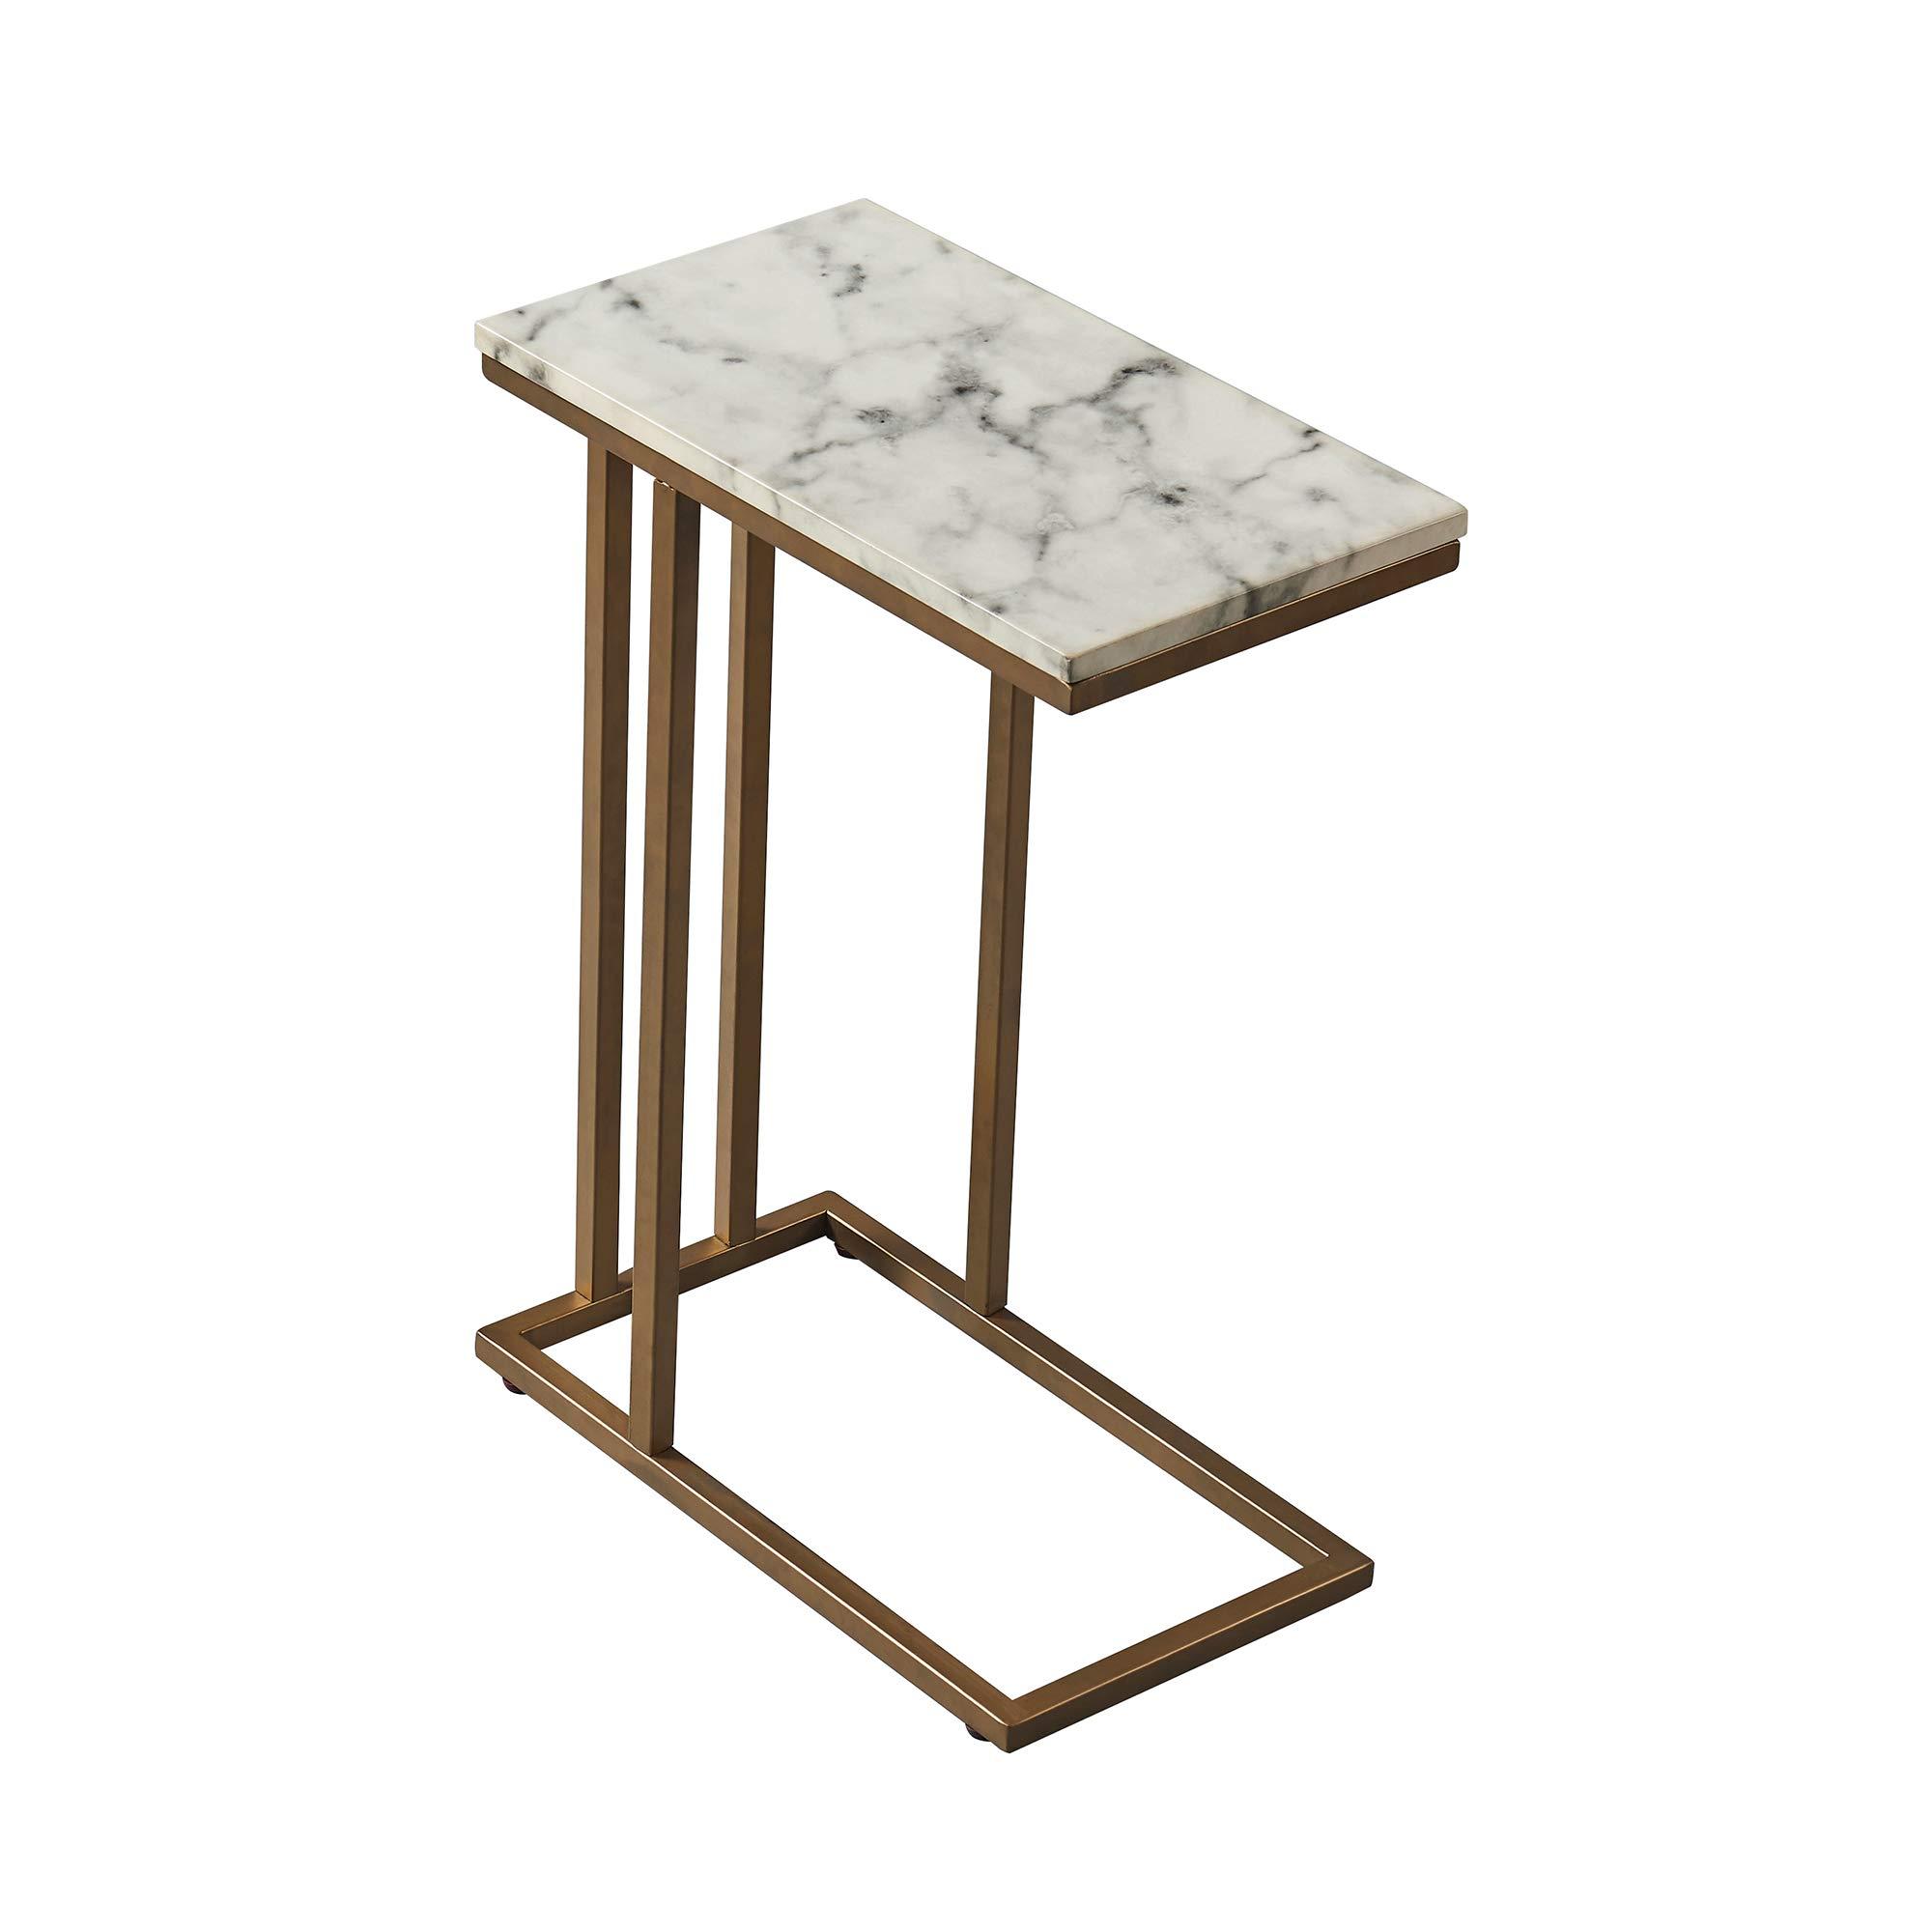 Versanora - Marmo C Shape Table - Faux Marble /Brass by Versanora (Image #1)